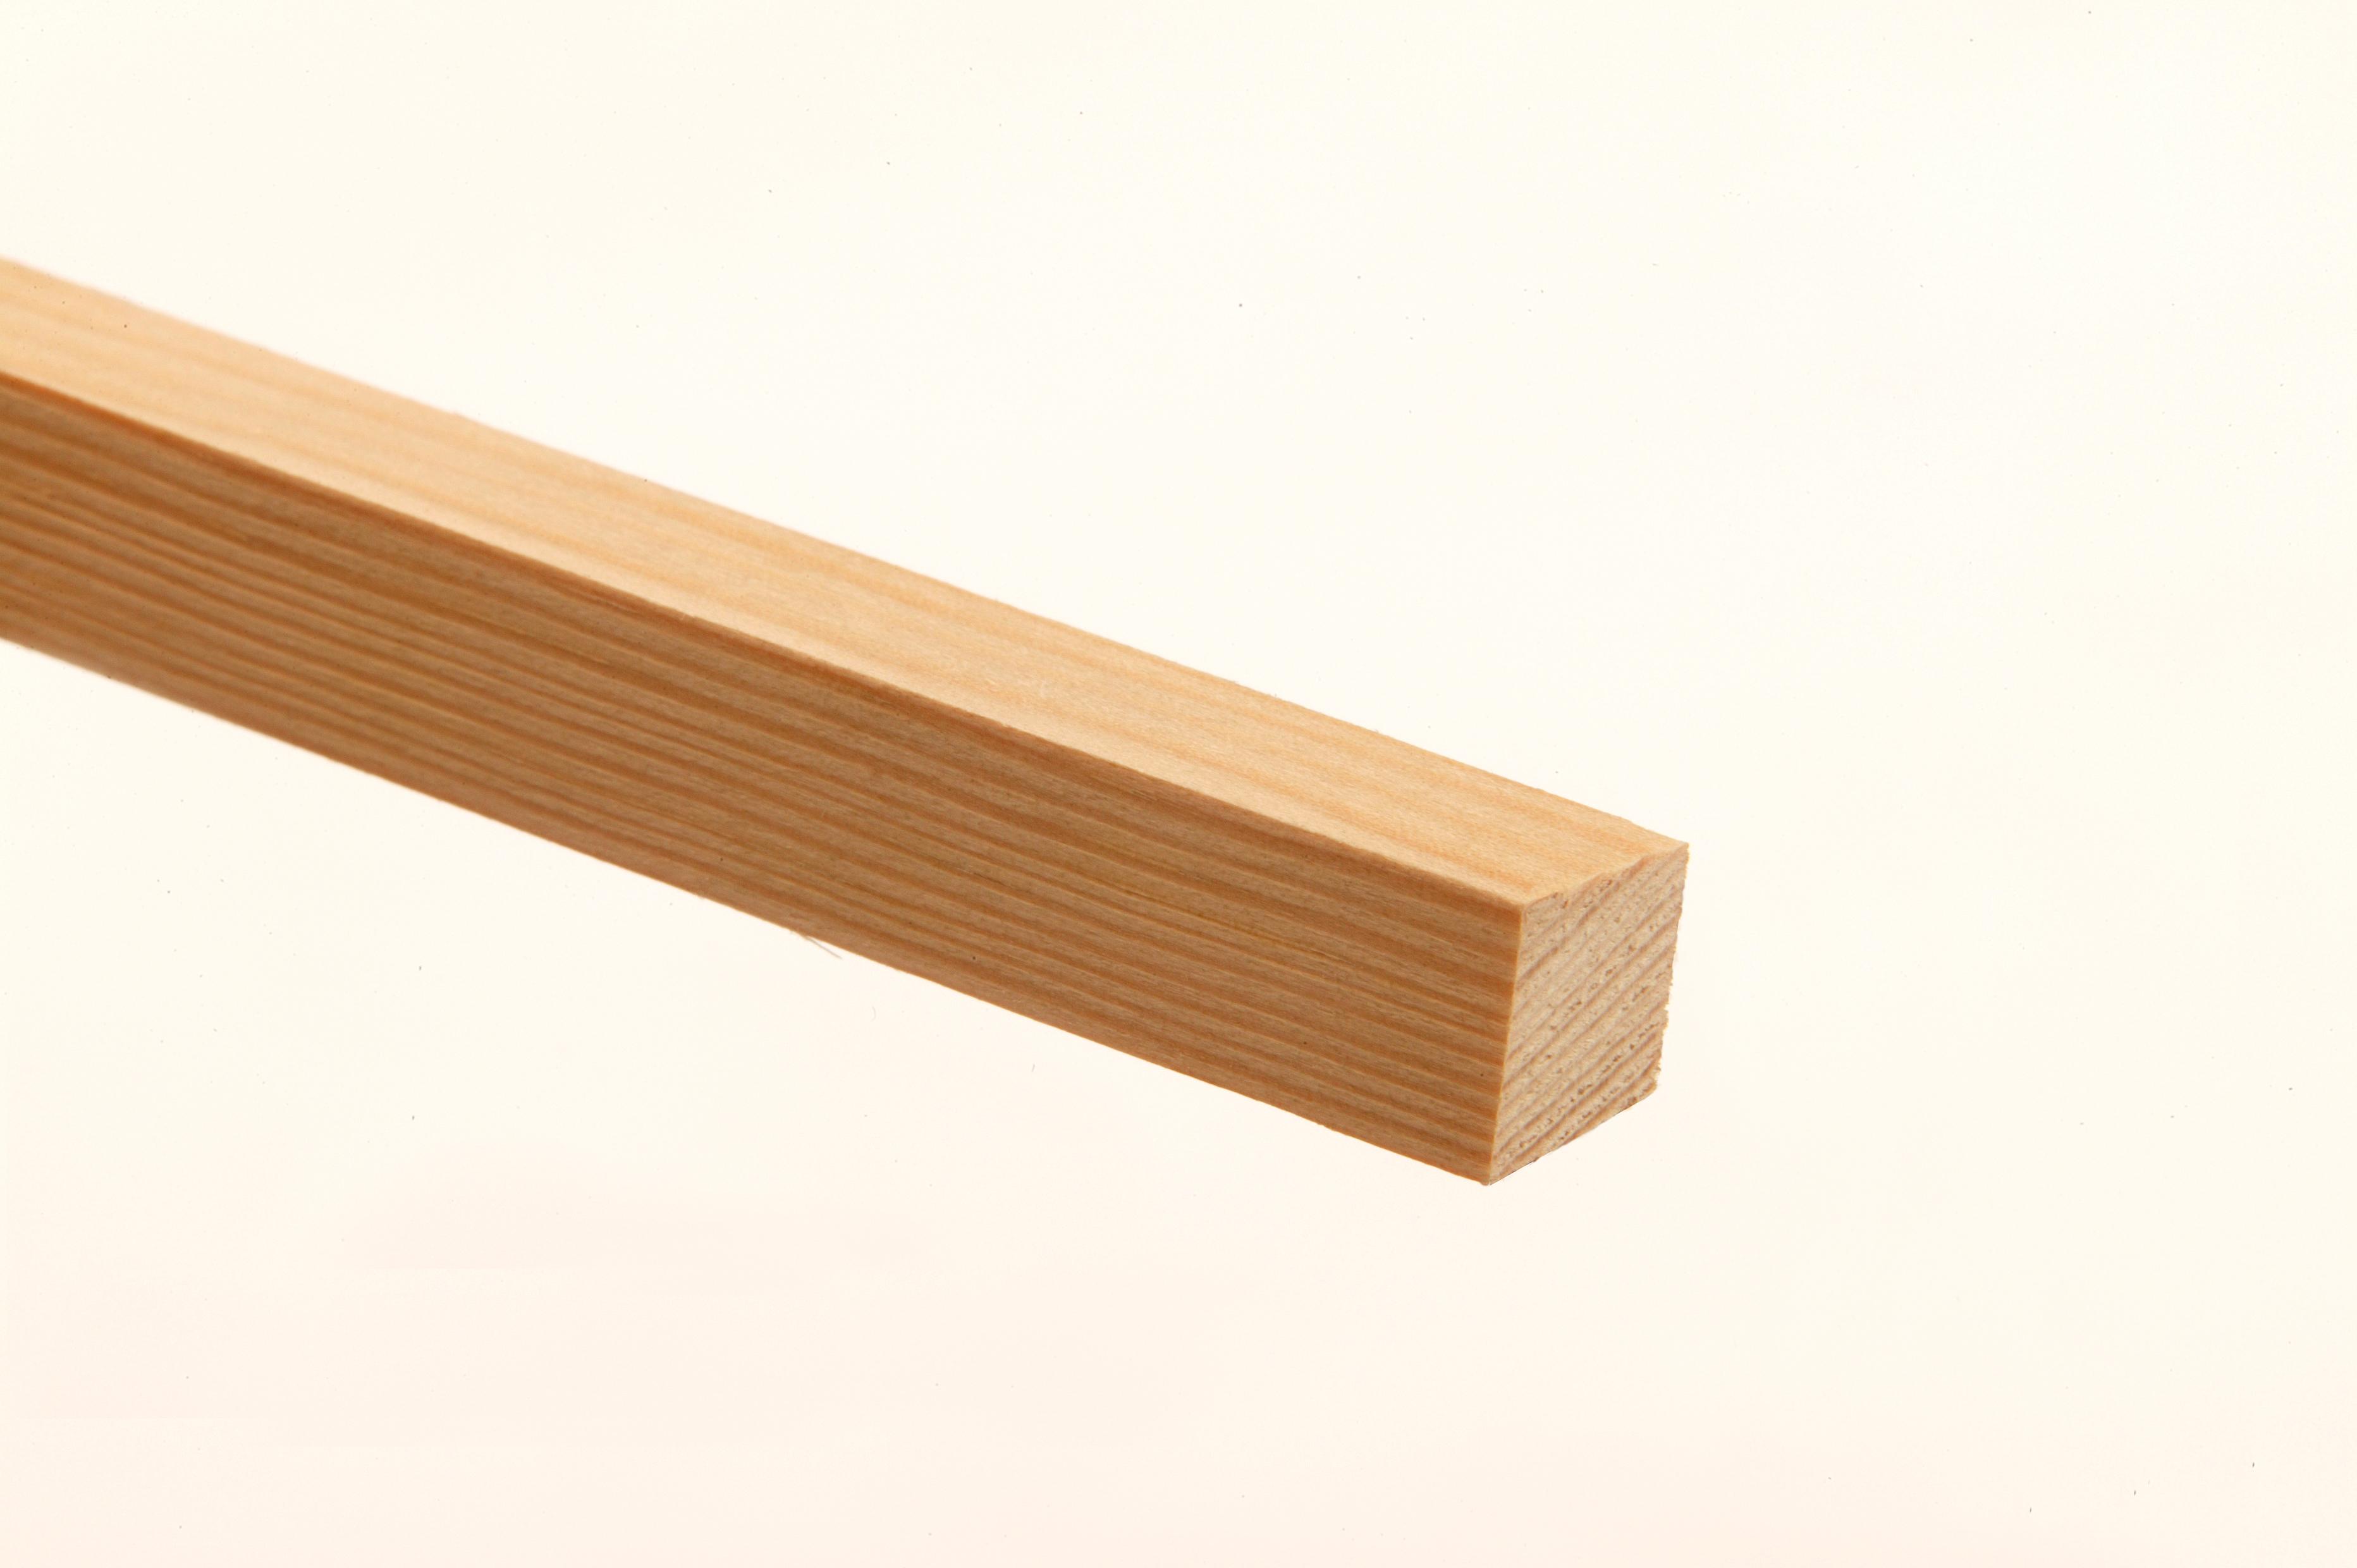 20 Pine PSE Stripwood 15 x 15 x 2400mm